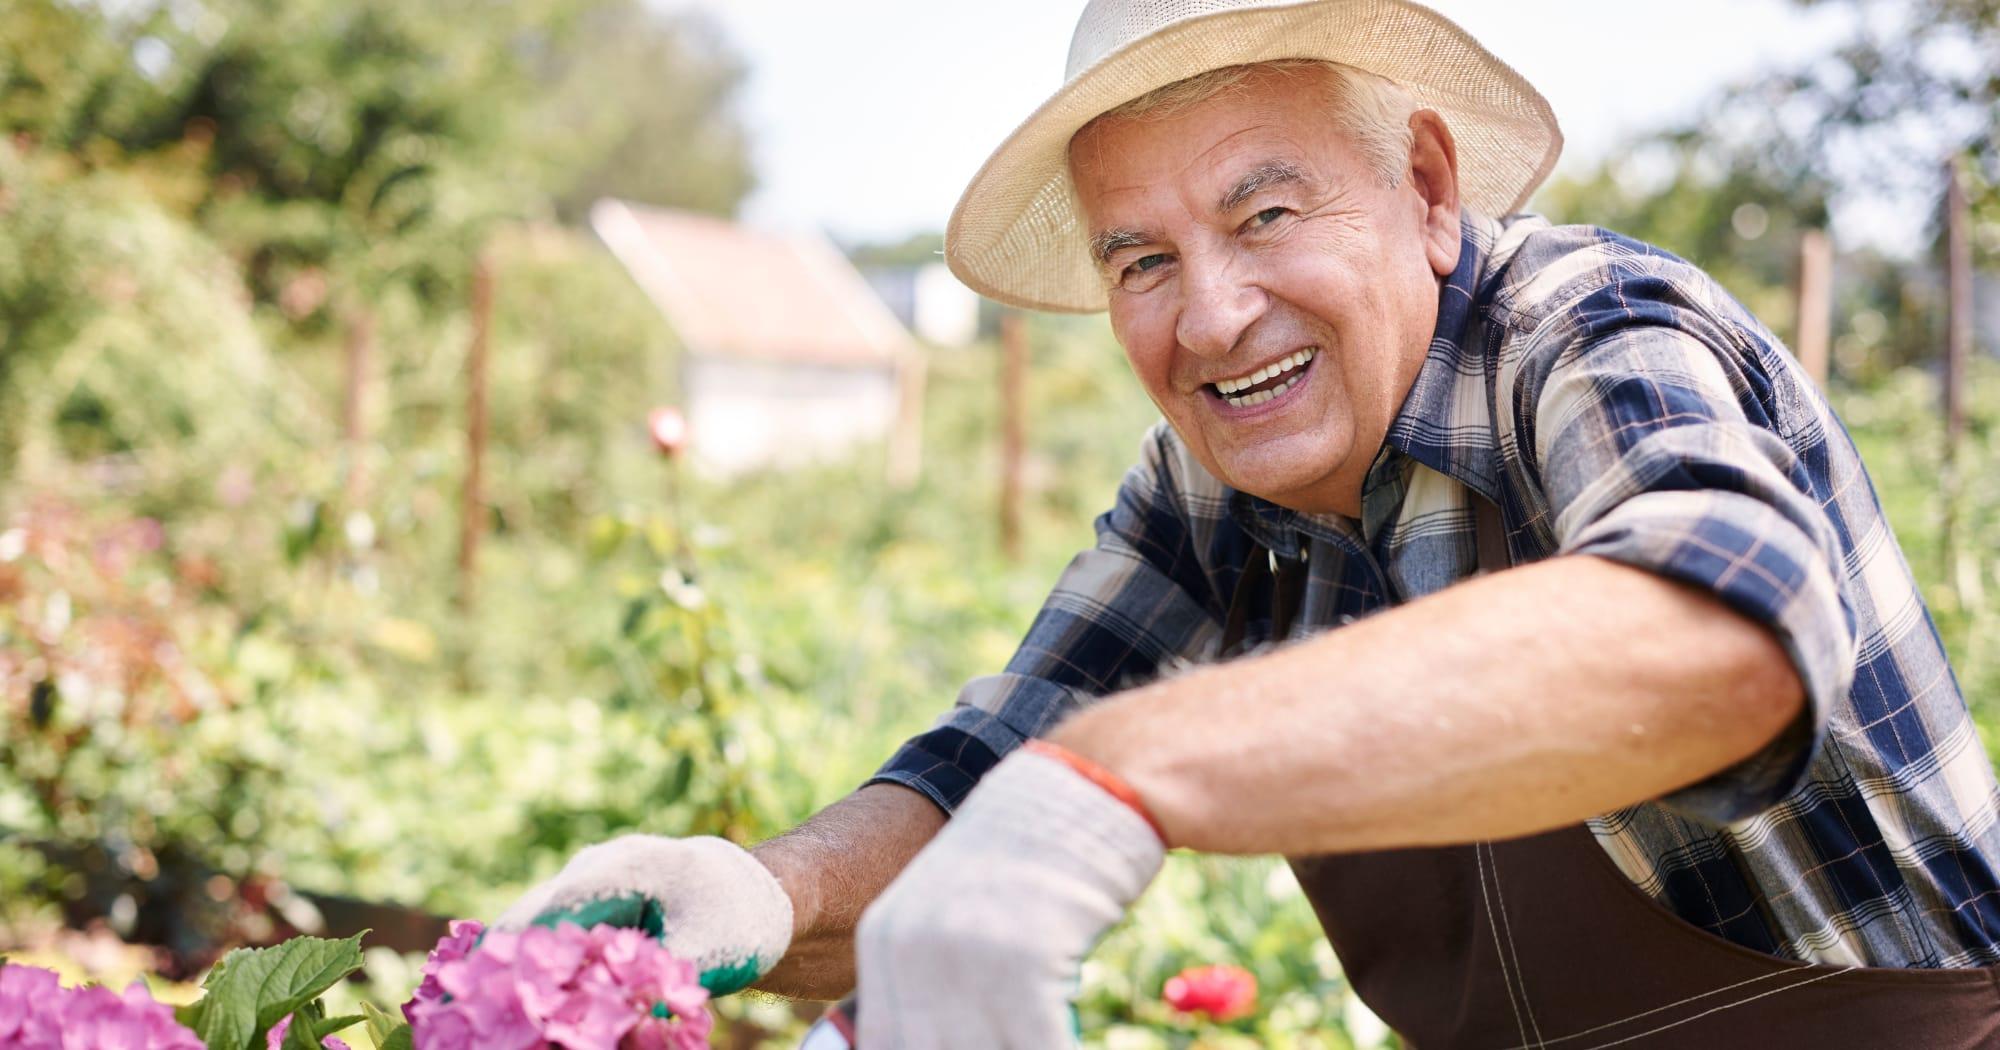 An elderly gentleman gardening outside at Brightwater Senior Living in Bend, Oregon